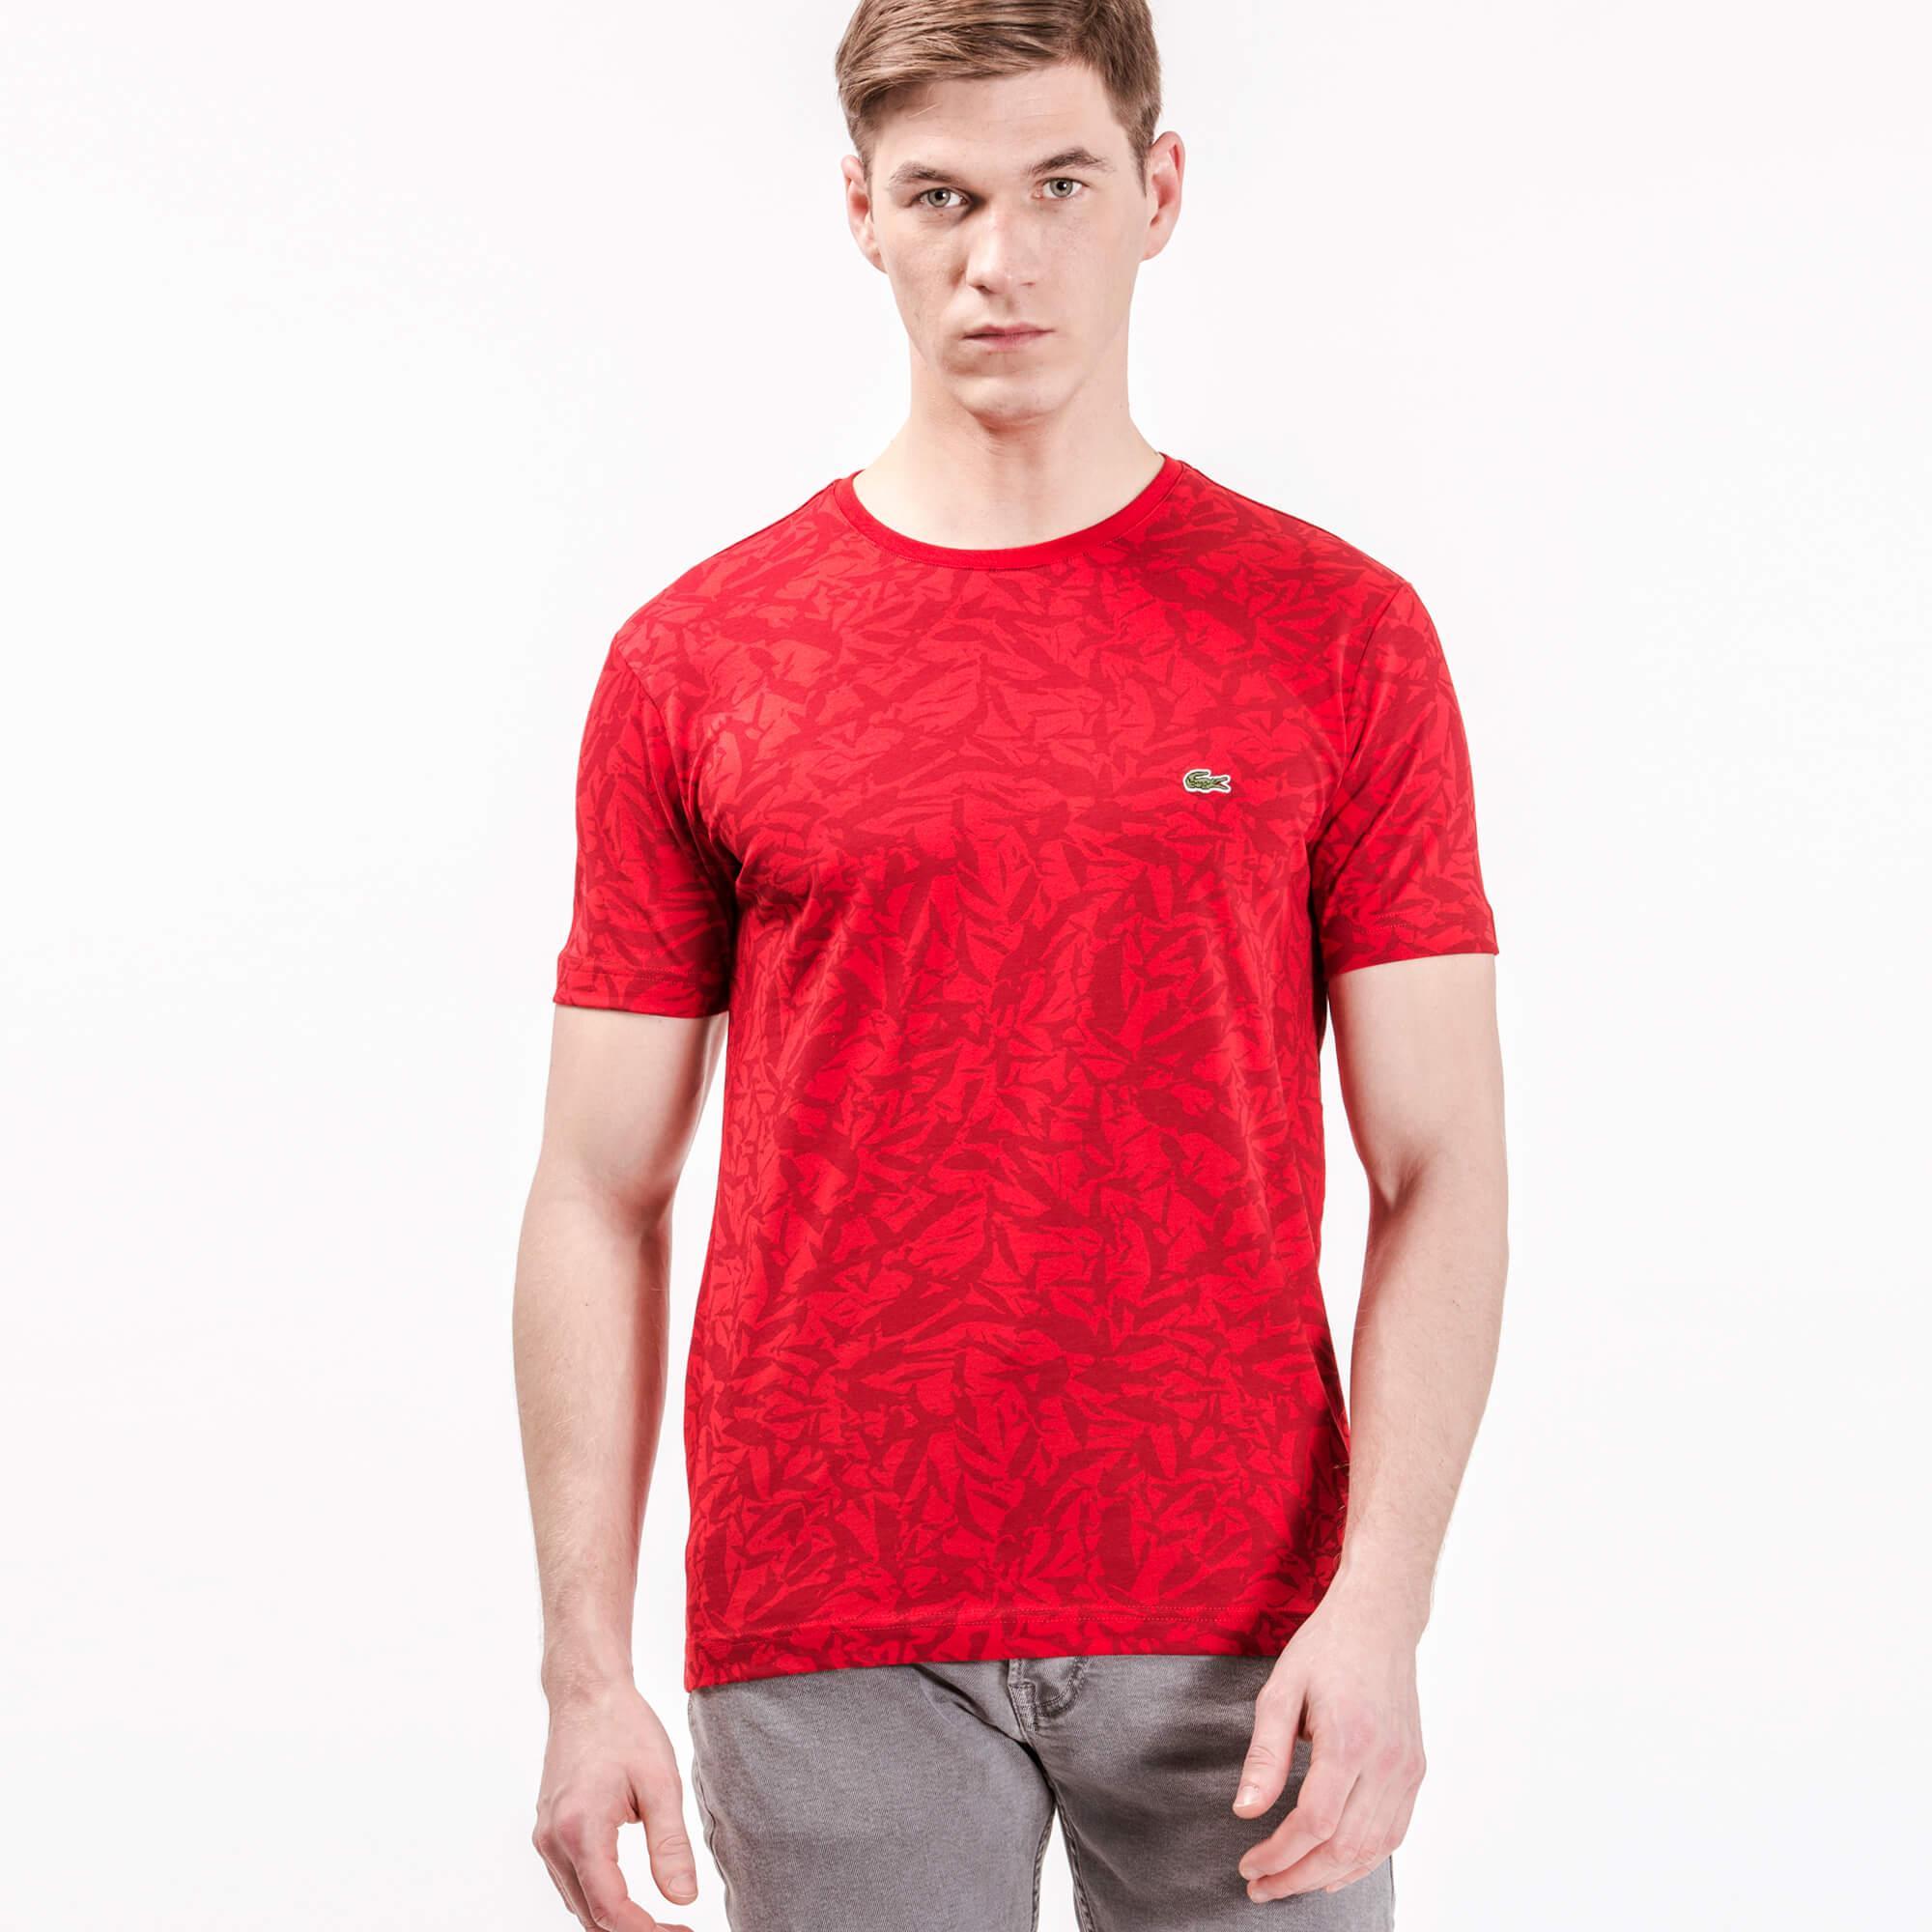 Lacoste Erkek Slim Fit Kırmızı T-Shirt